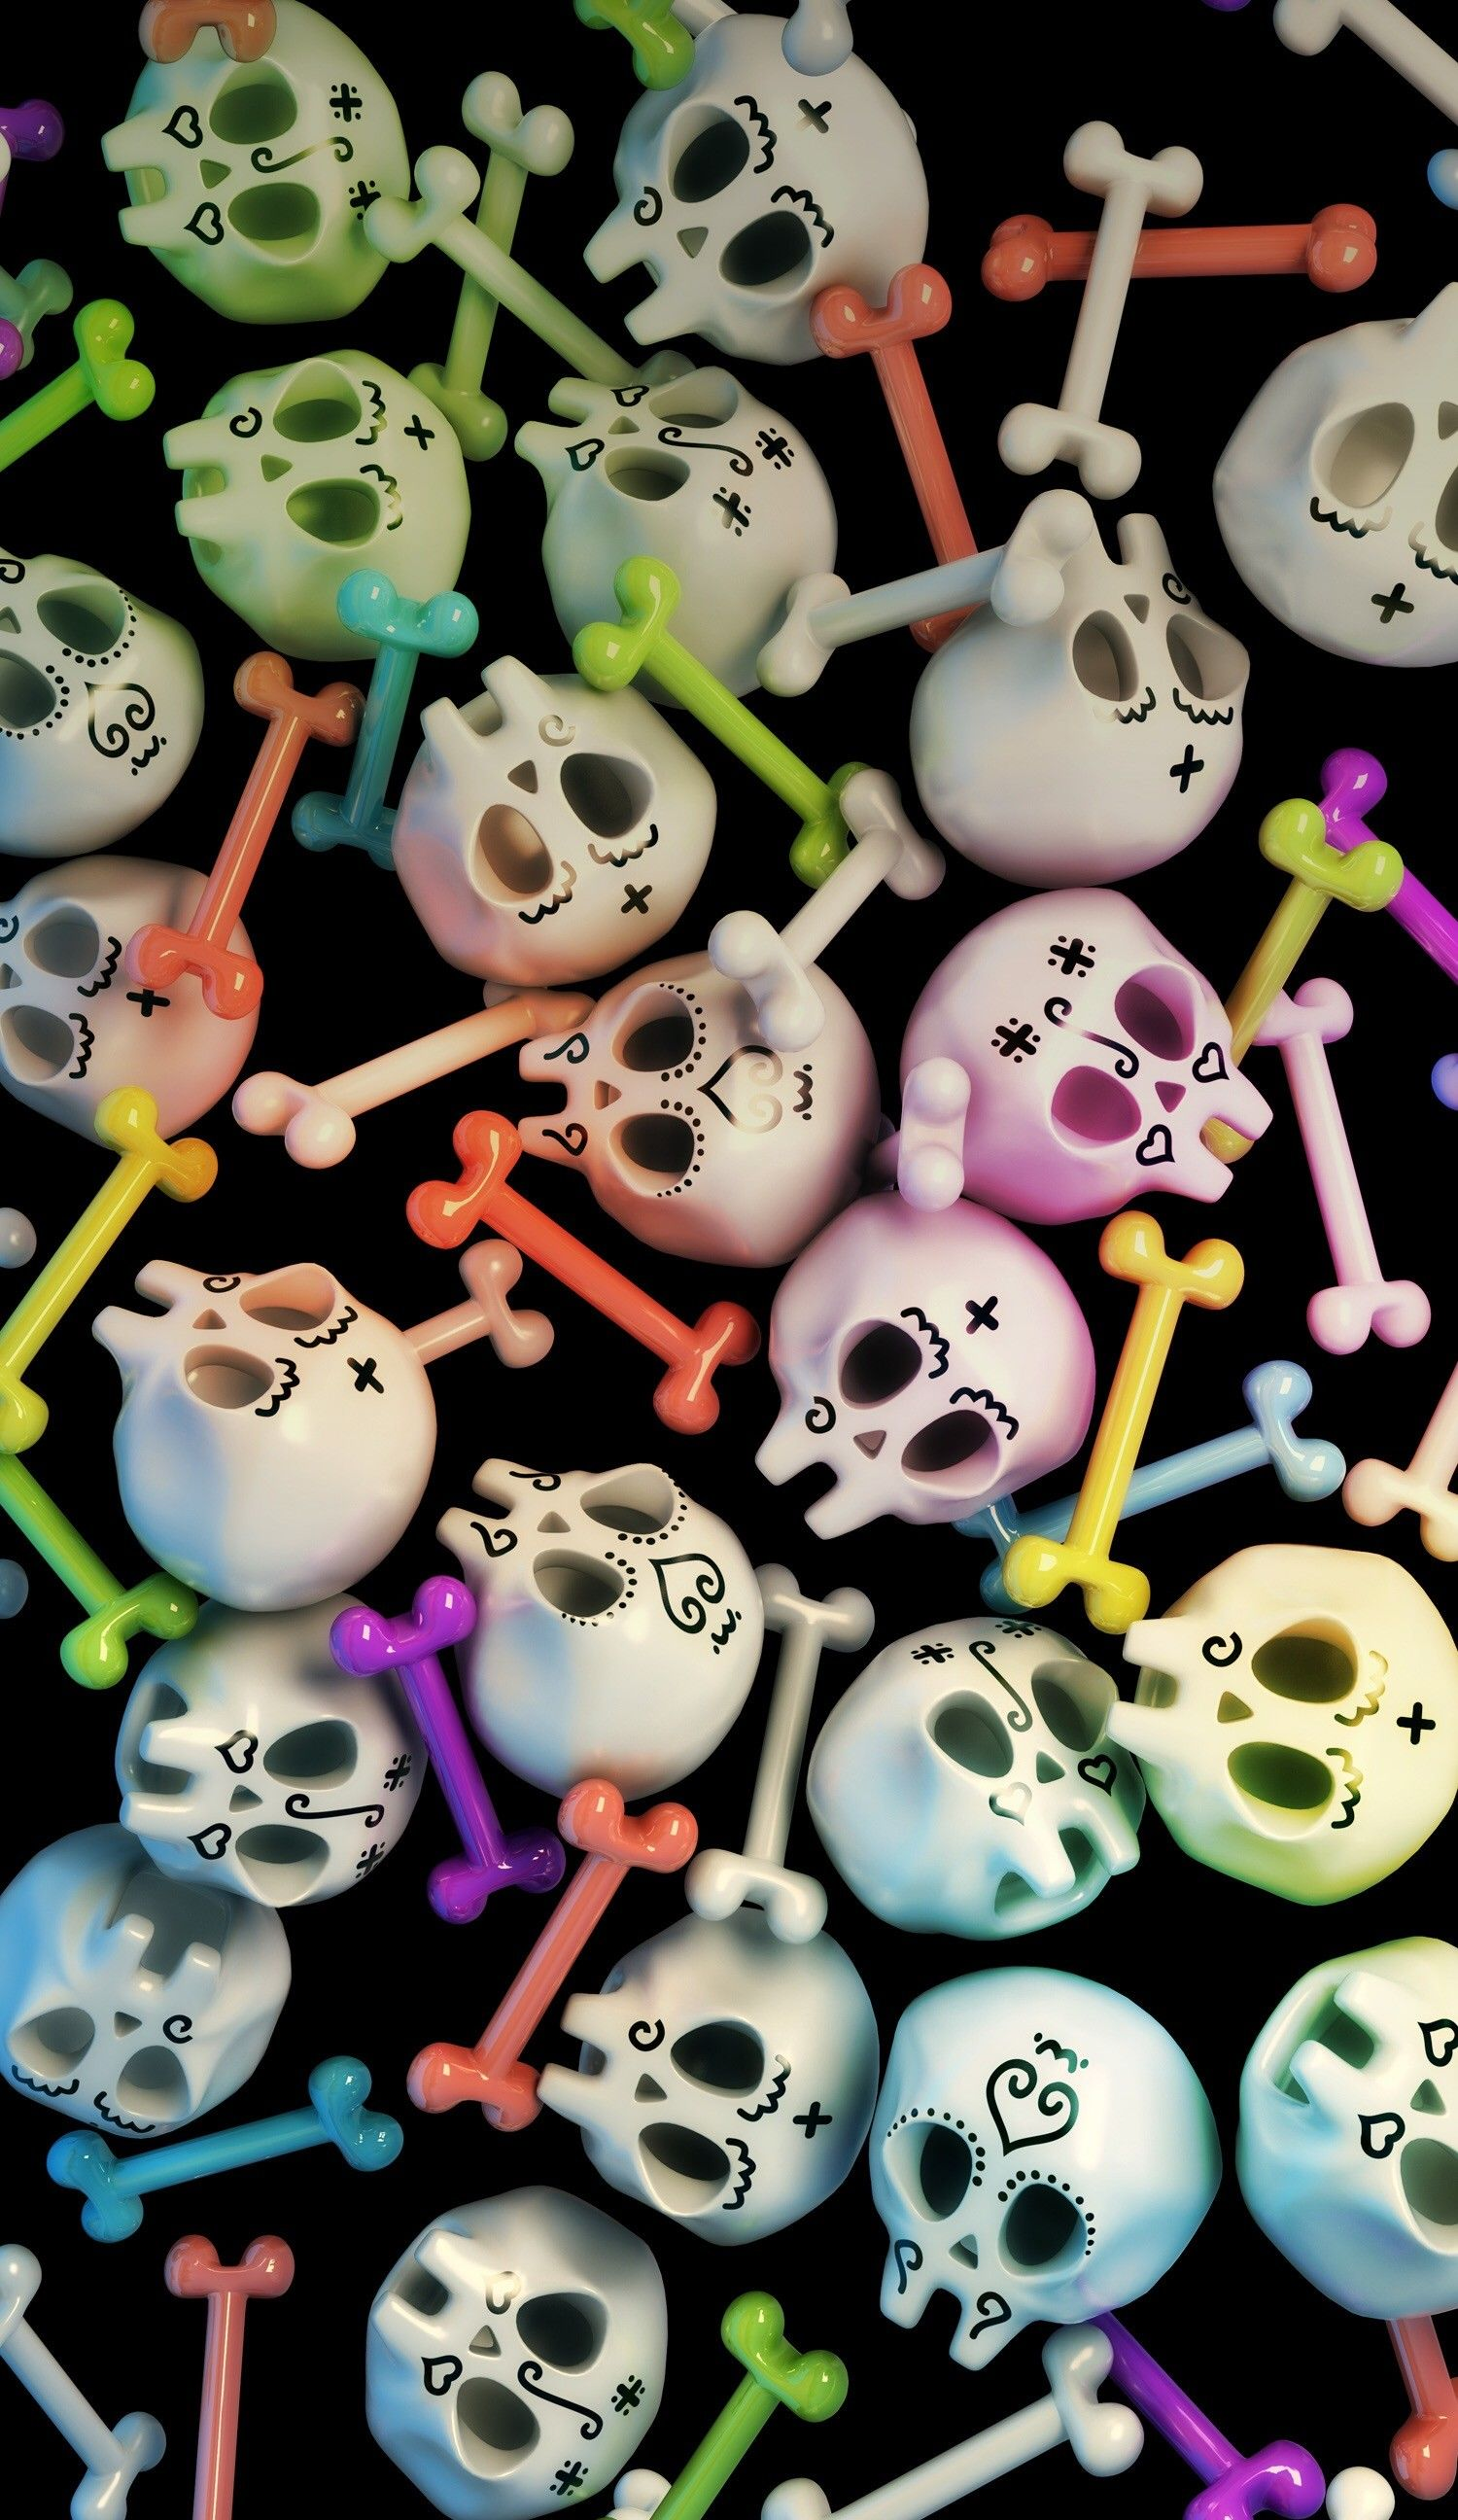 Sugar Skull Backgrounds wallpapers 2020 Skull